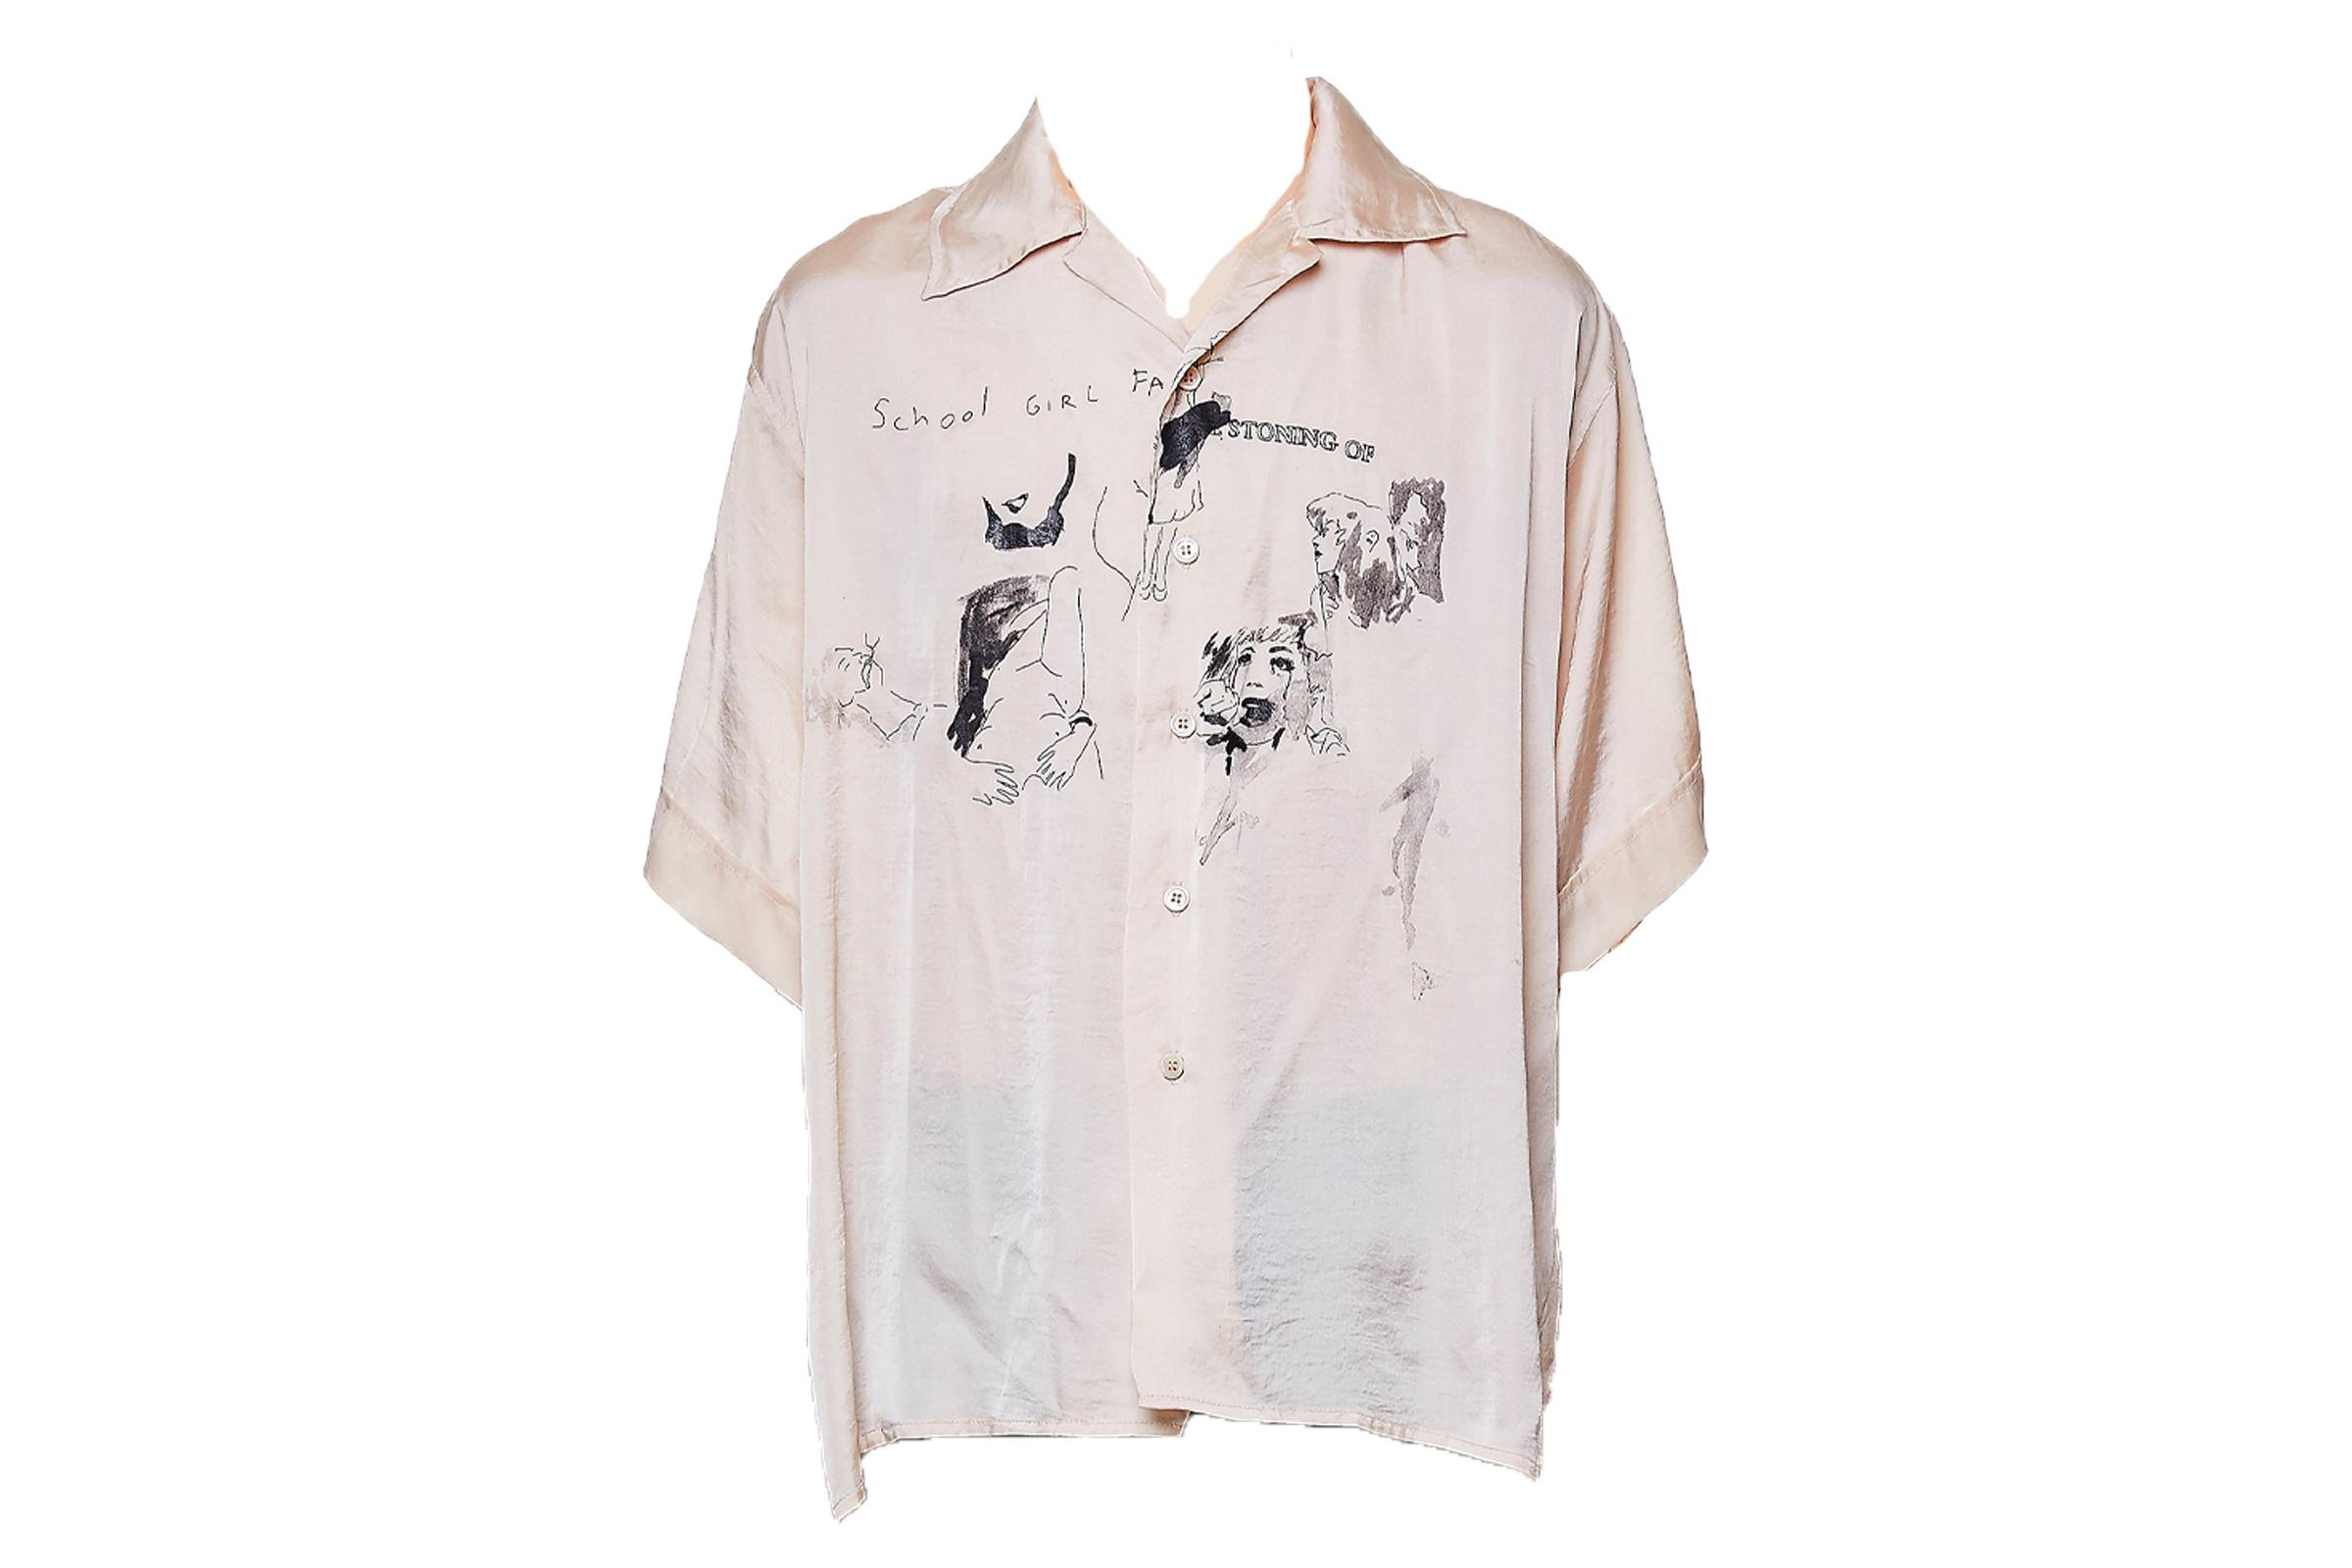 Enfants Riches Deprimes School Girls Silk Shirt